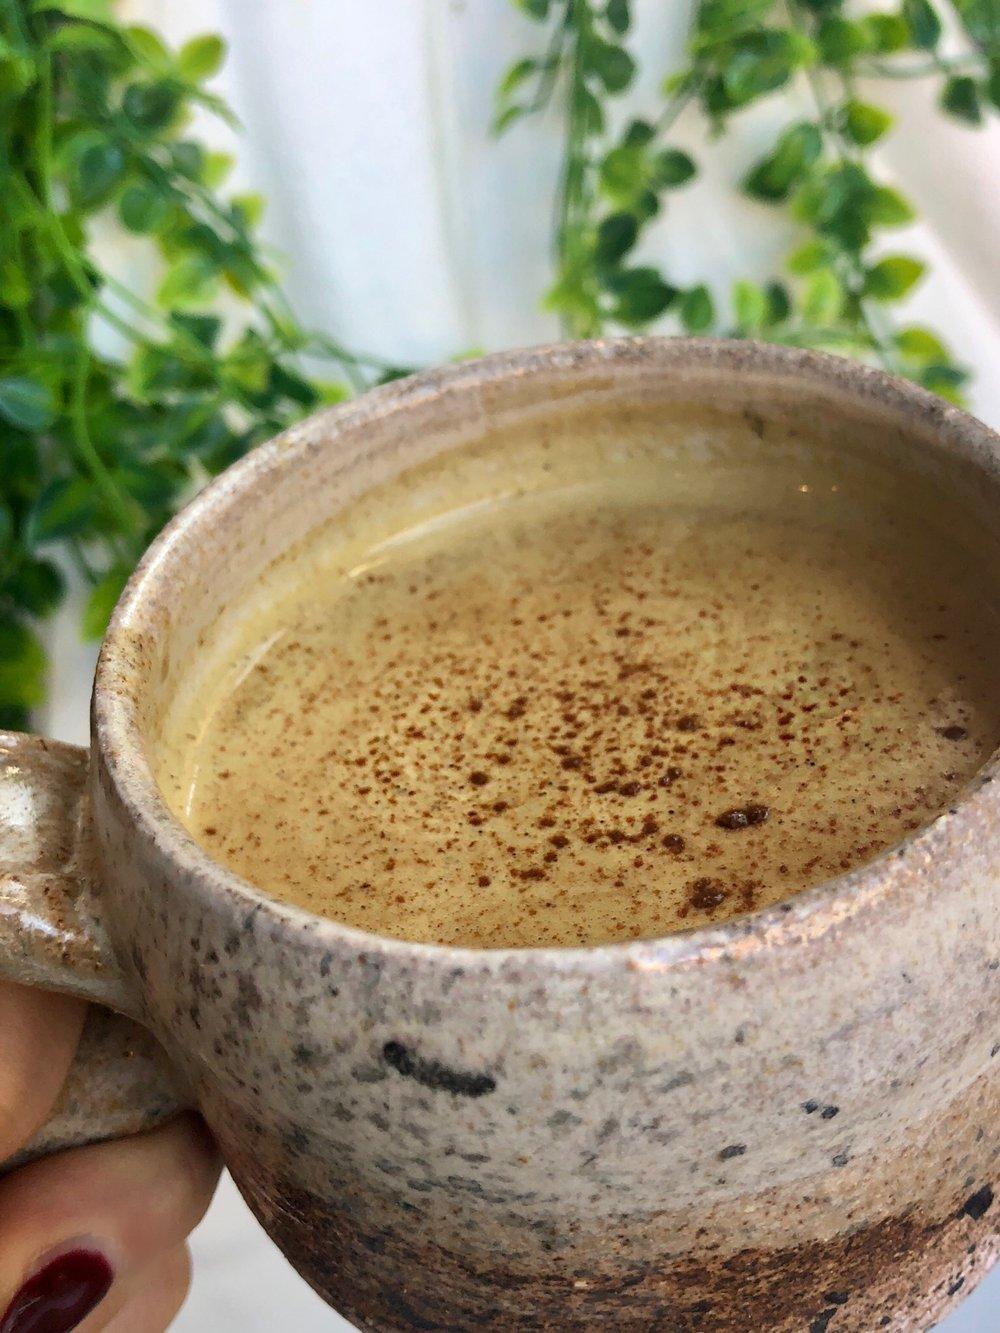 Healthy Pumpkin Spice Latte | Dairy-Free, Vegan, Sugar-Free, Paleo, Keto & Calling Your Name